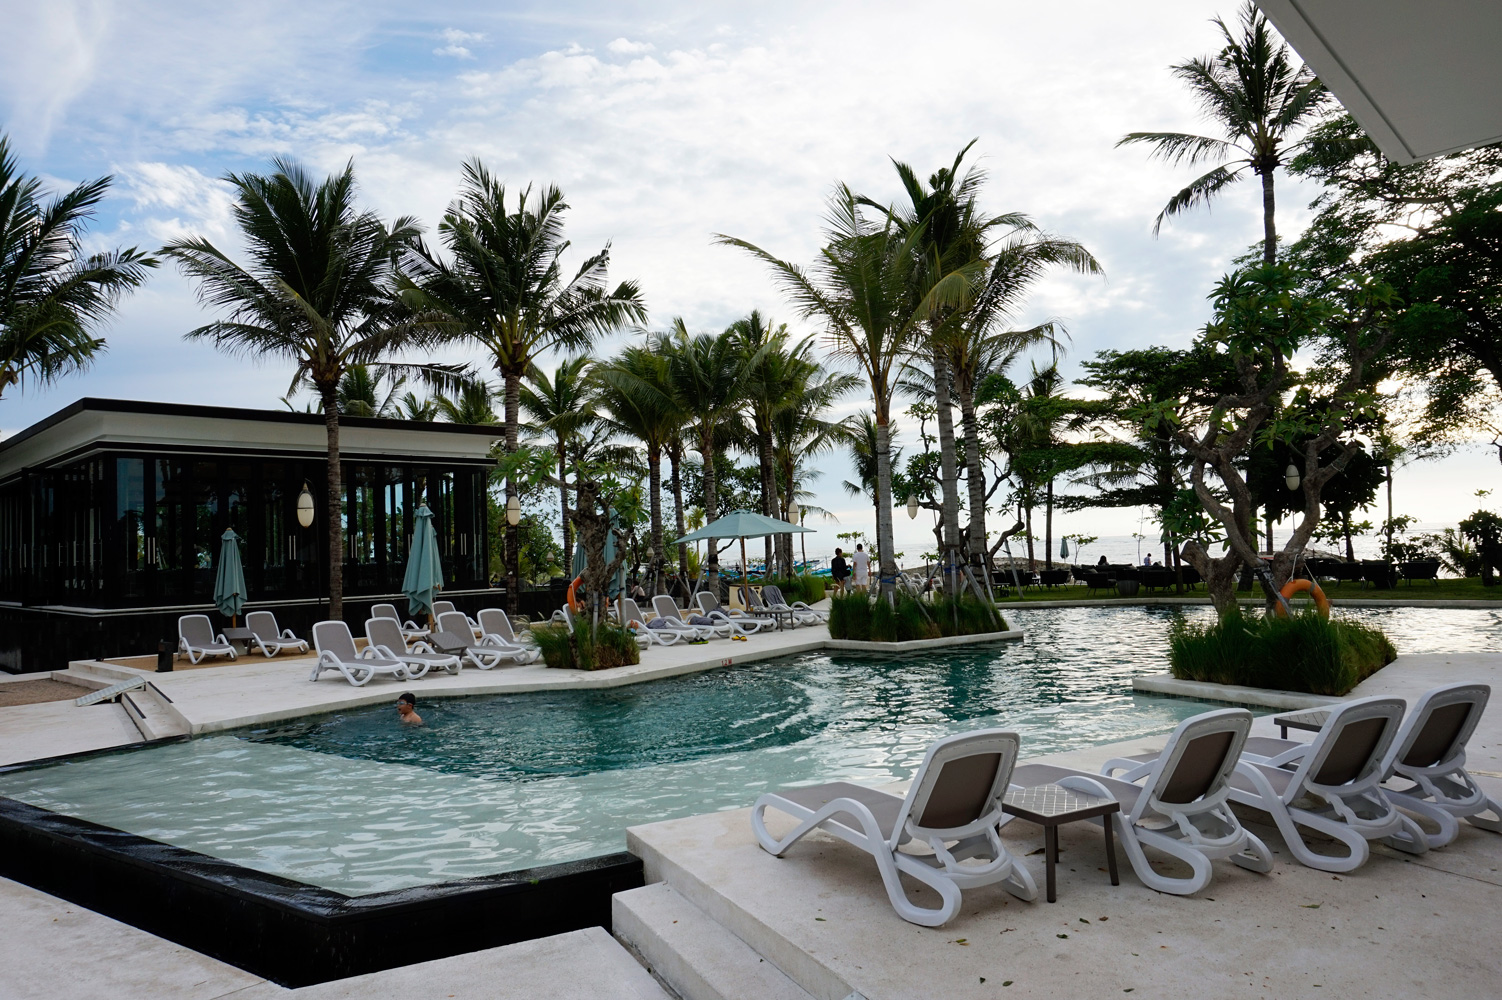 Hotel Bali Beach